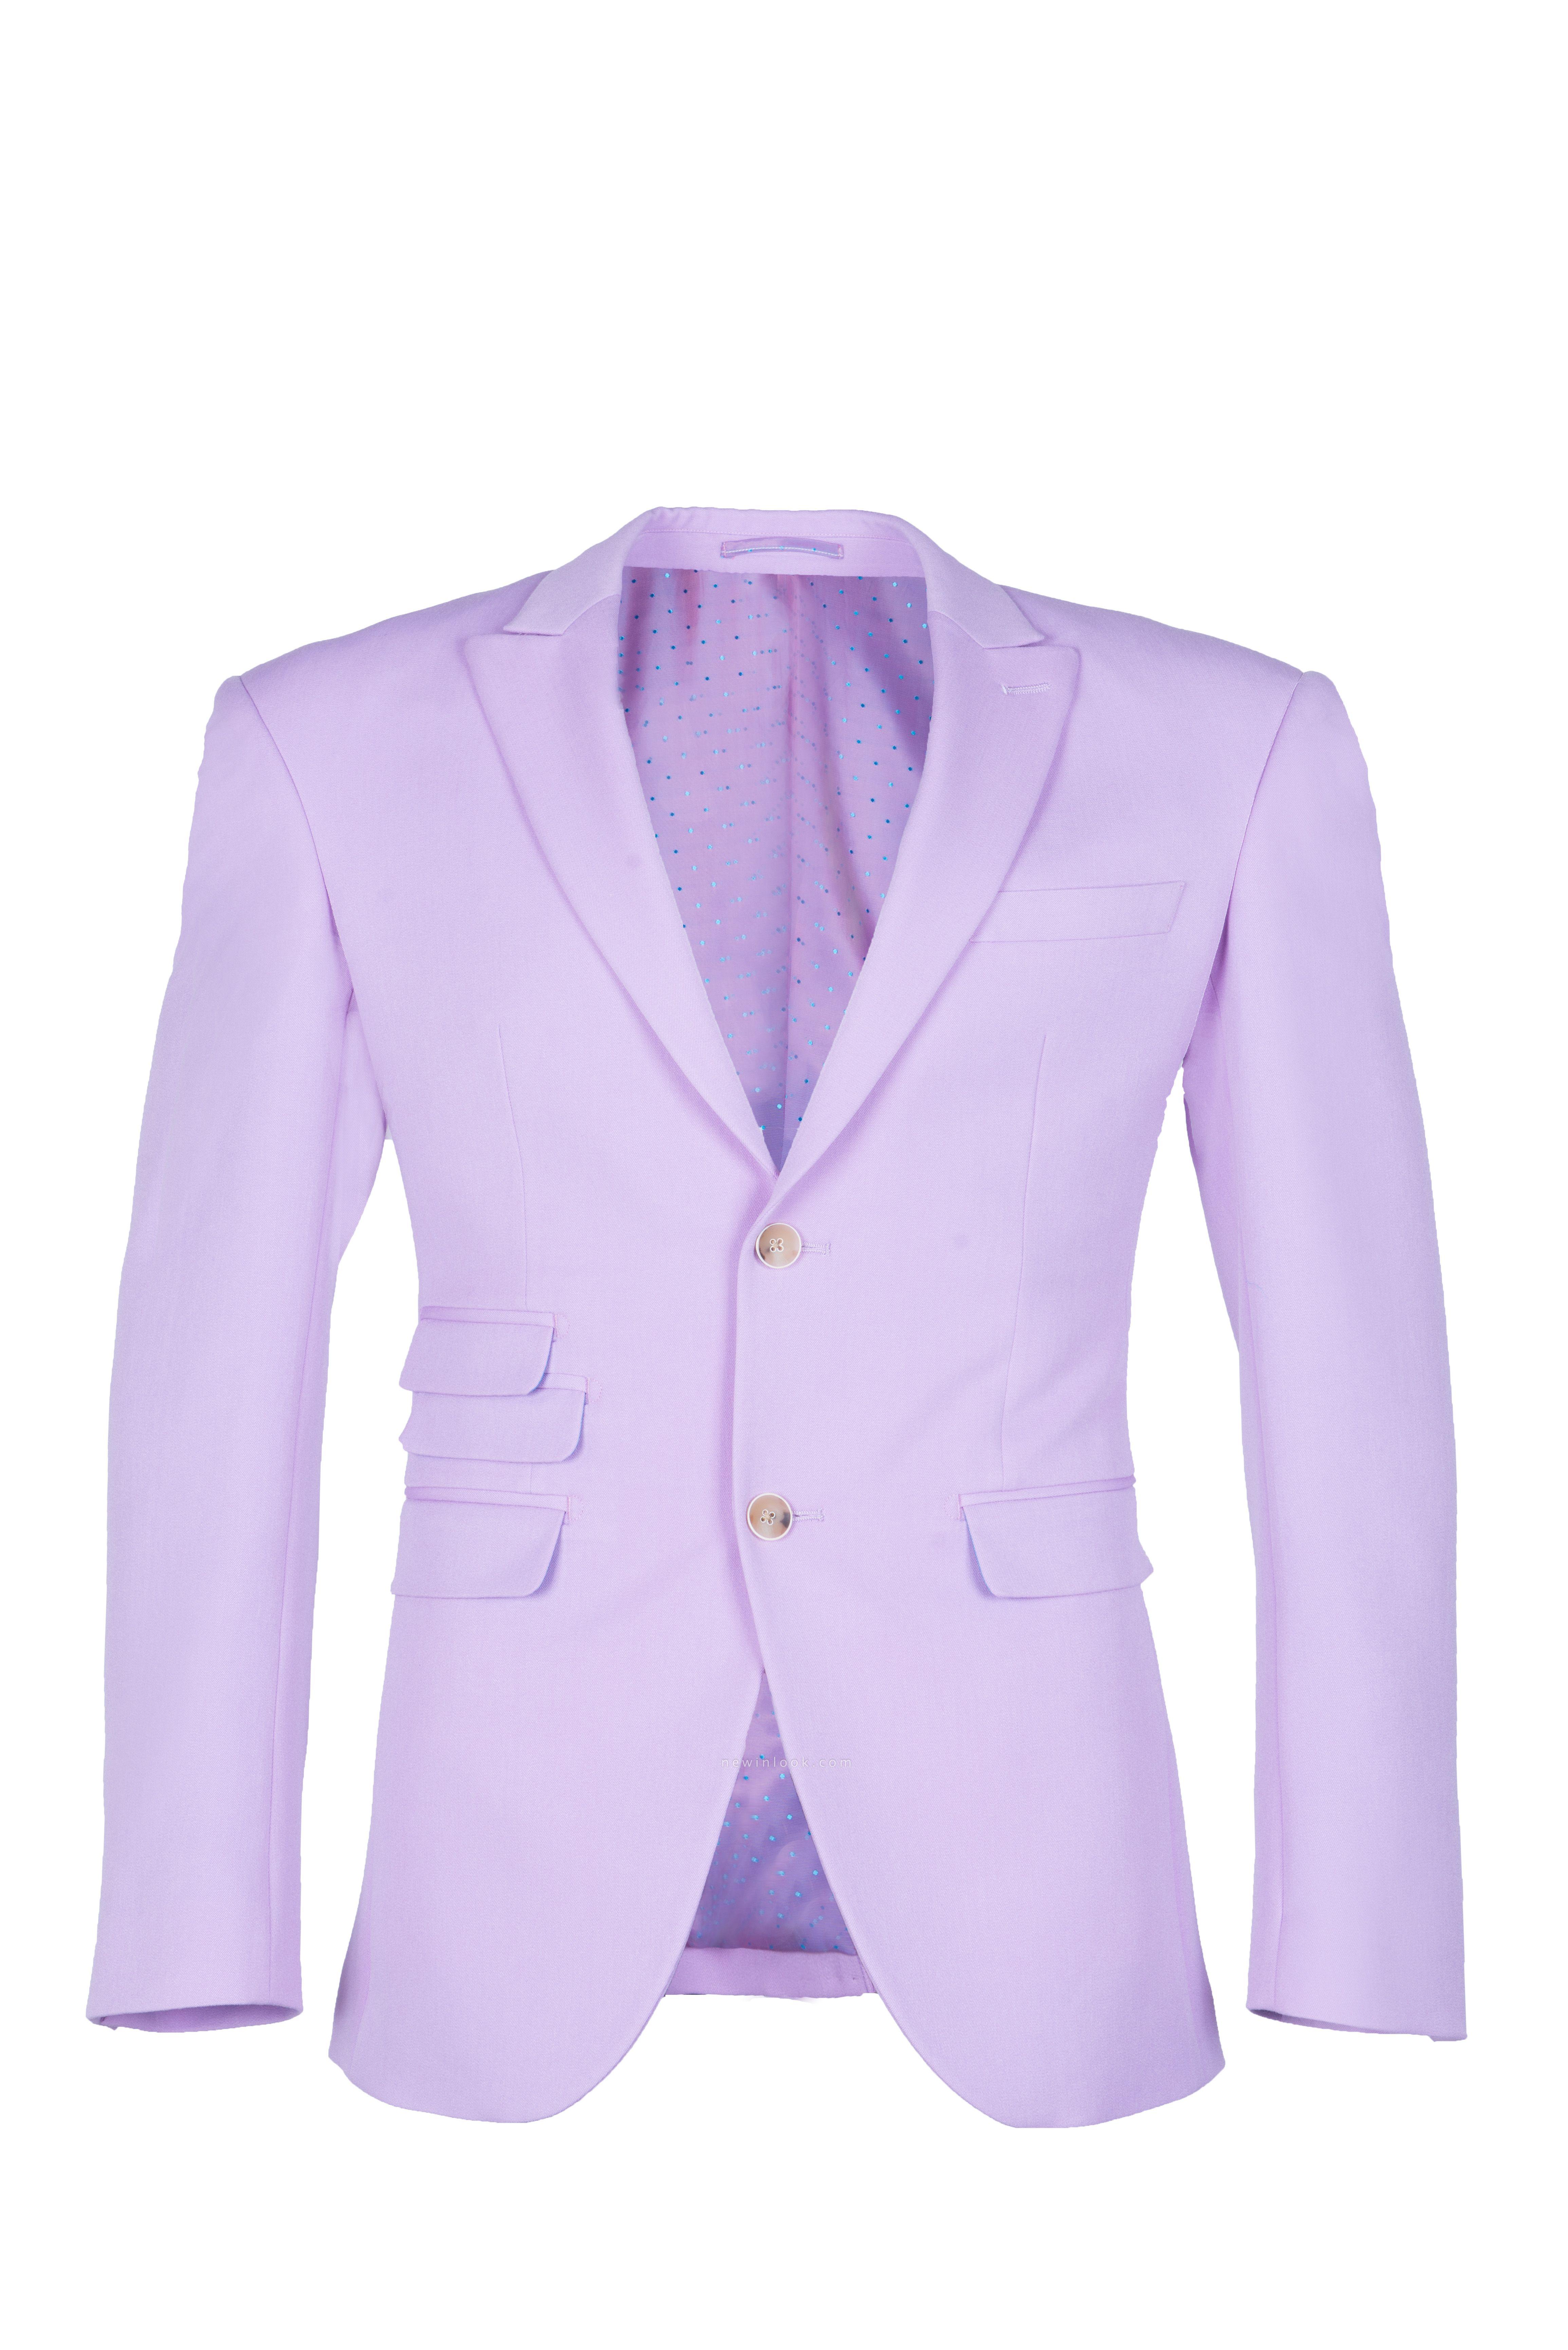 Hot Recommend Peak Lapel High Quality Two Button Lavender Casual Suit